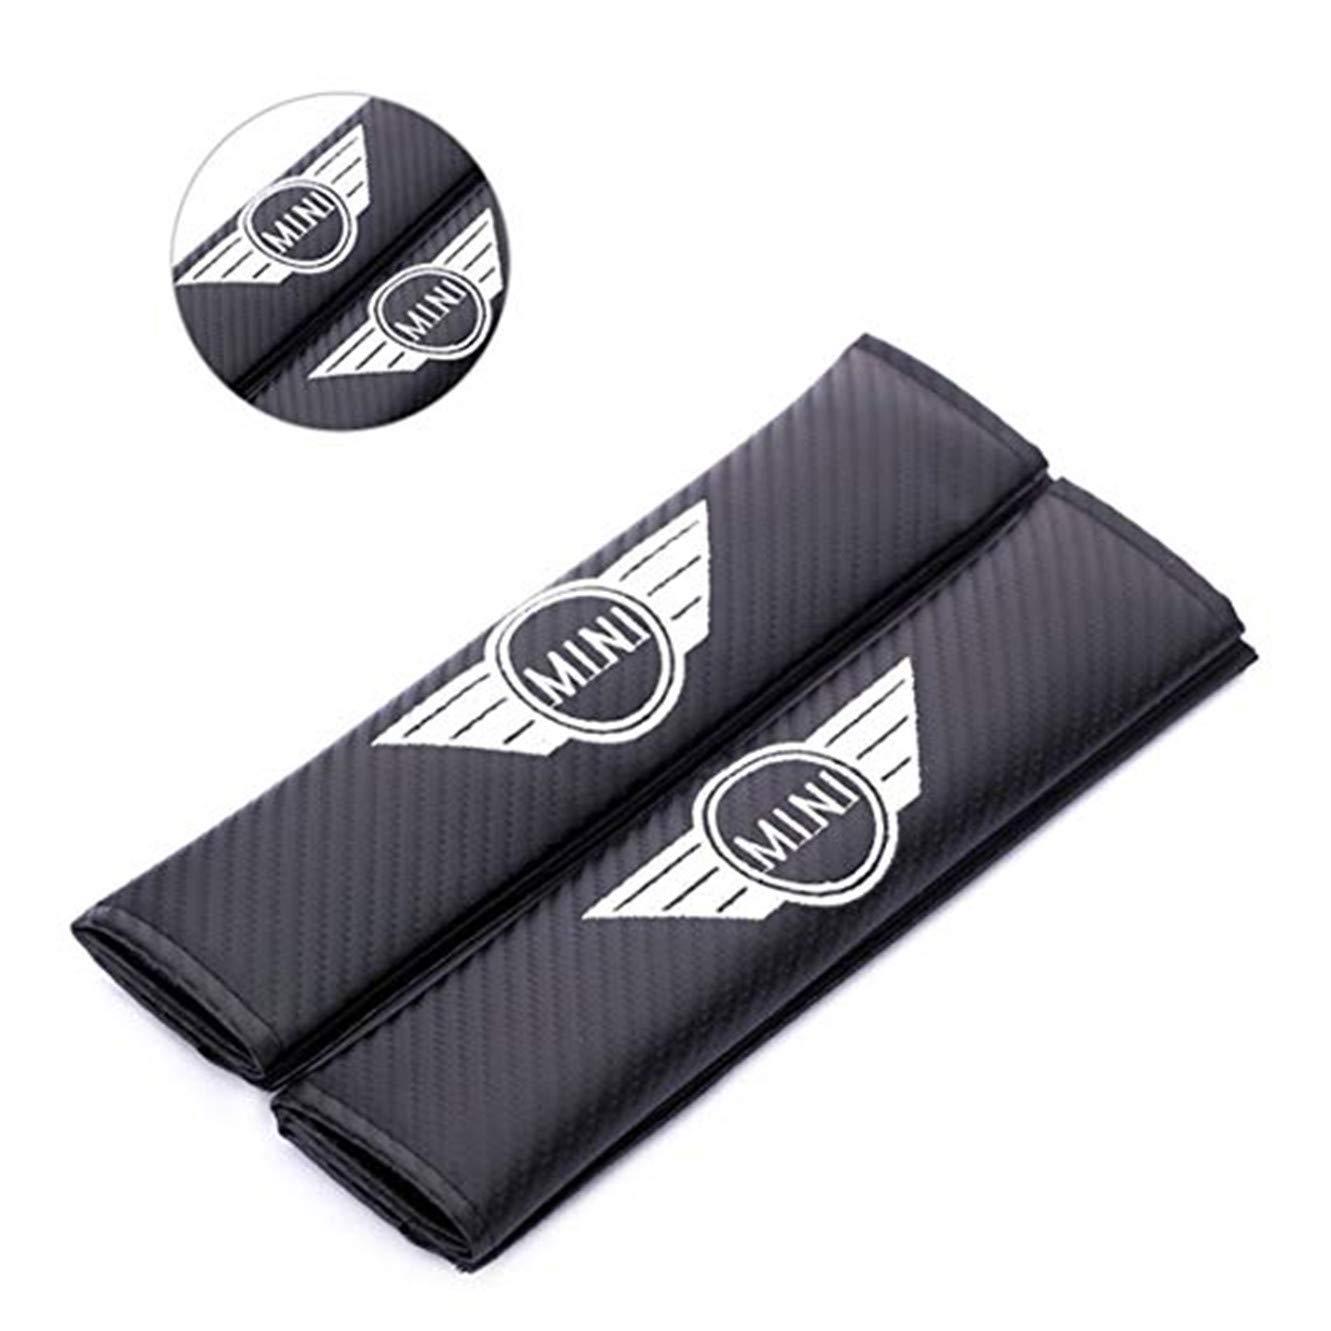 2 Fundas de Fibra de Carbono para cintur/ón de Seguridad de Coche con Bordado para Mini fanlinxin